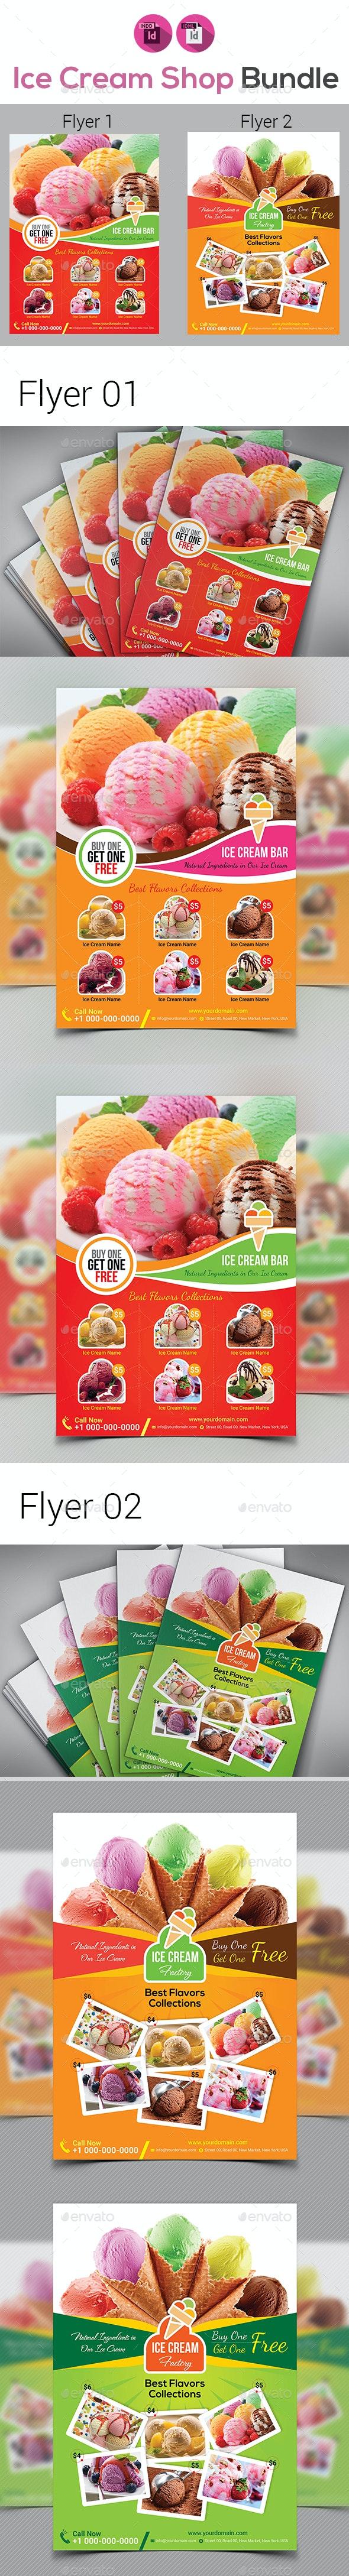 Ice Cream Shop Flyers Bundle - Flyers Print Templates